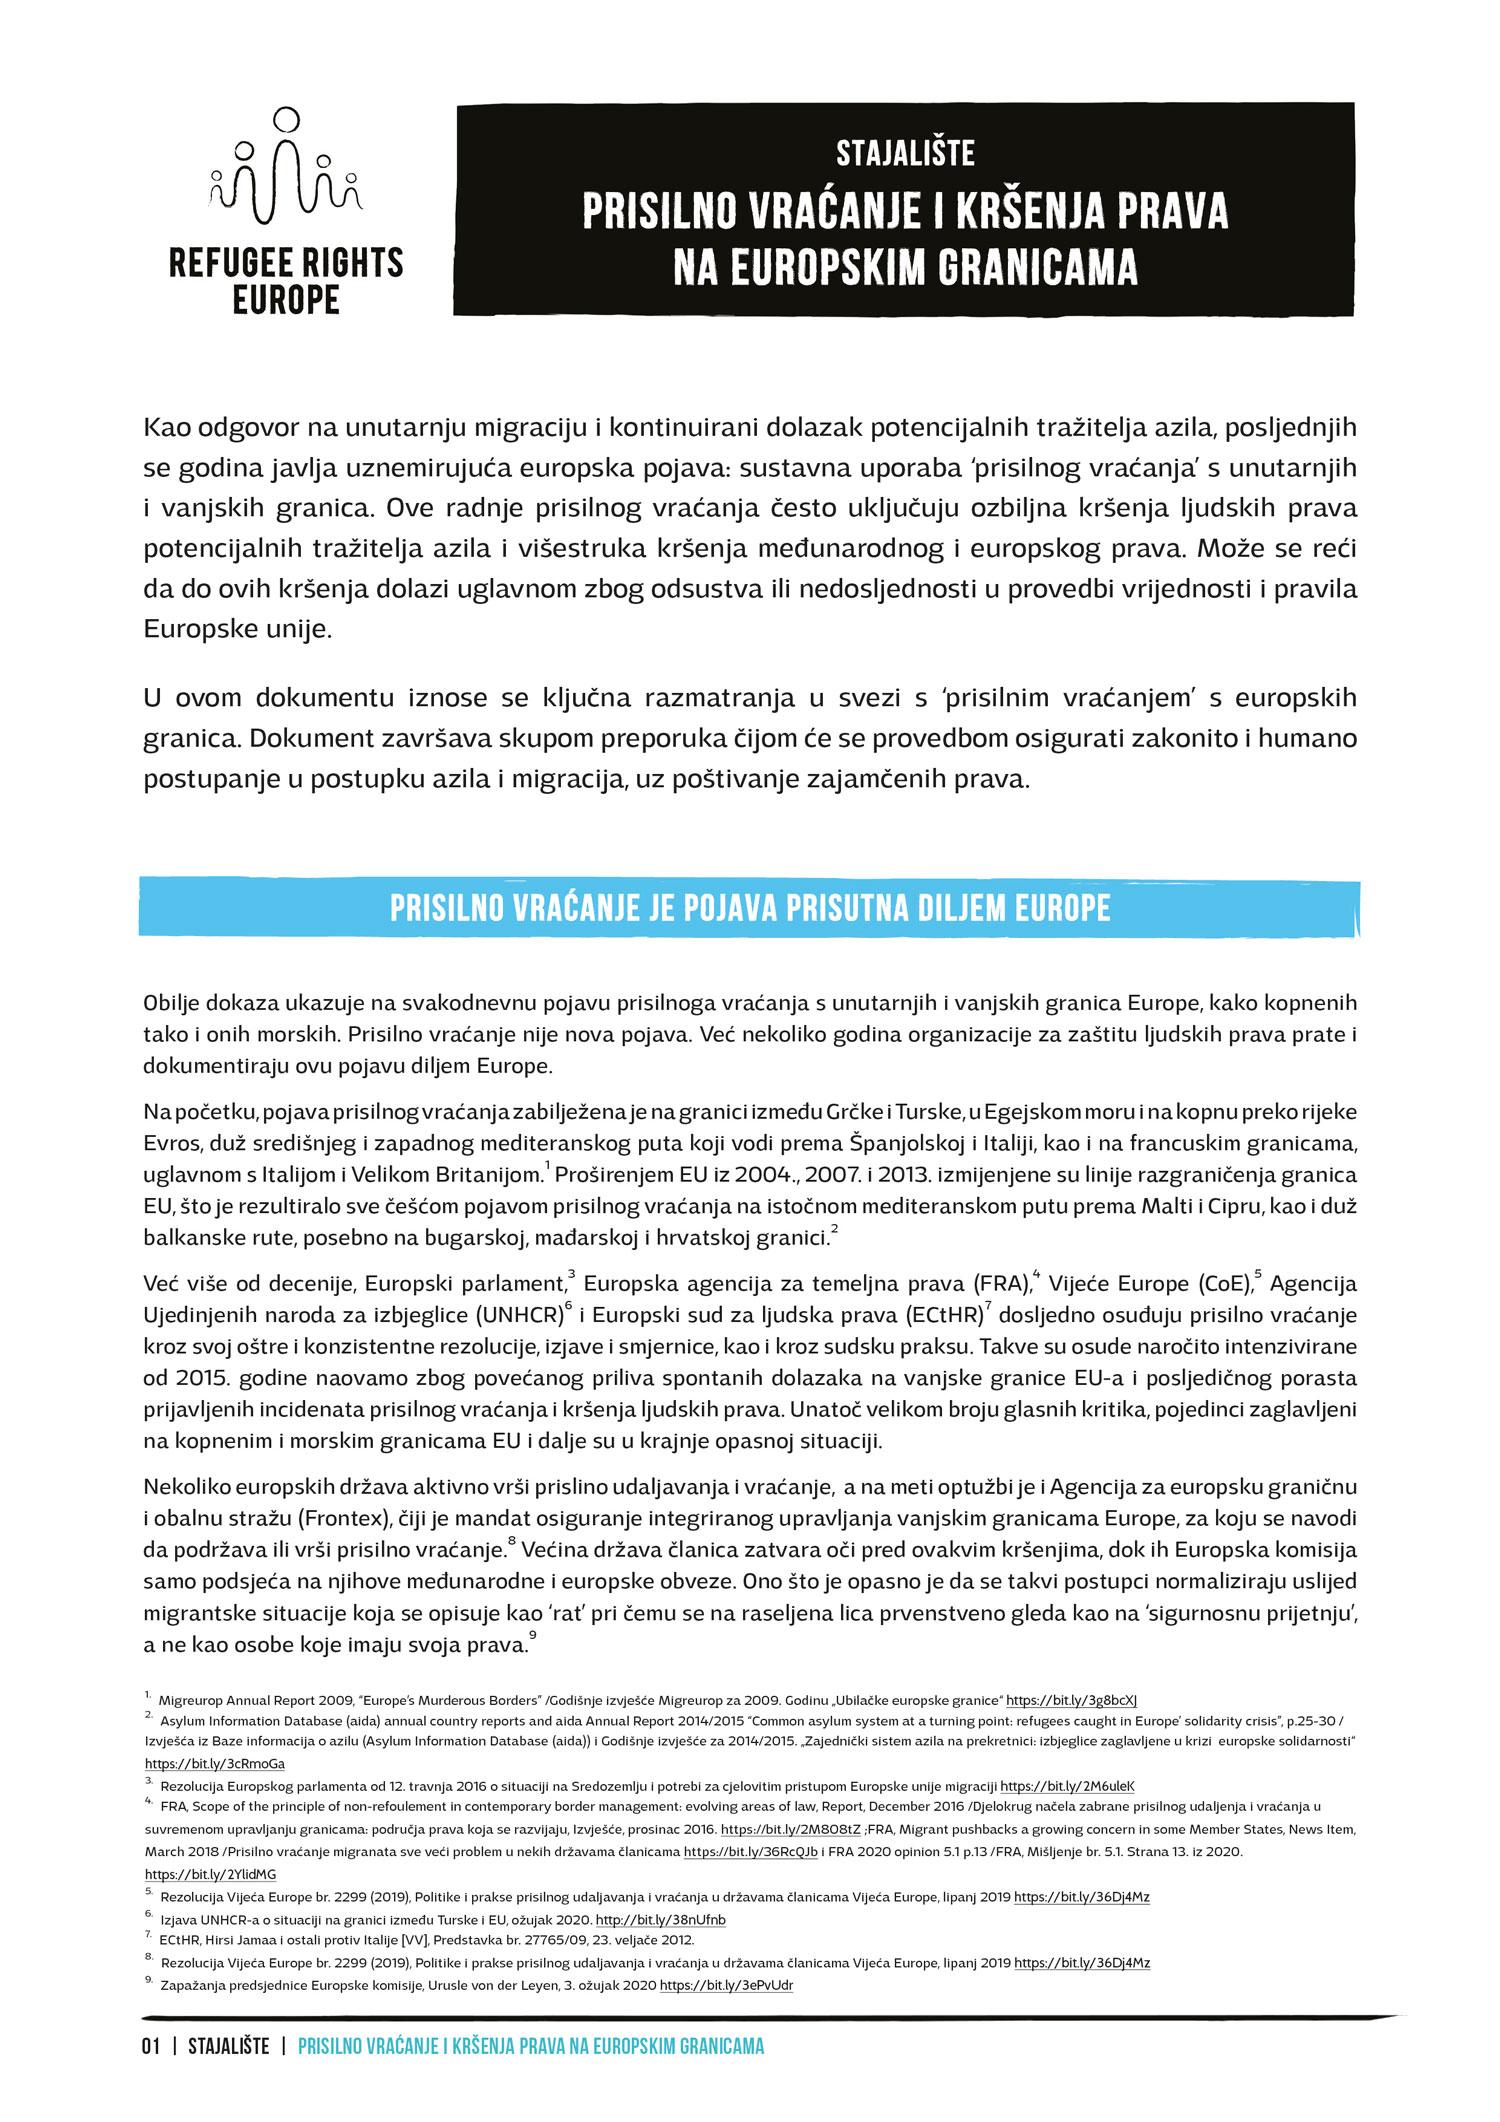 Refugee Rights Europe Prislno Vracanje Position Paper